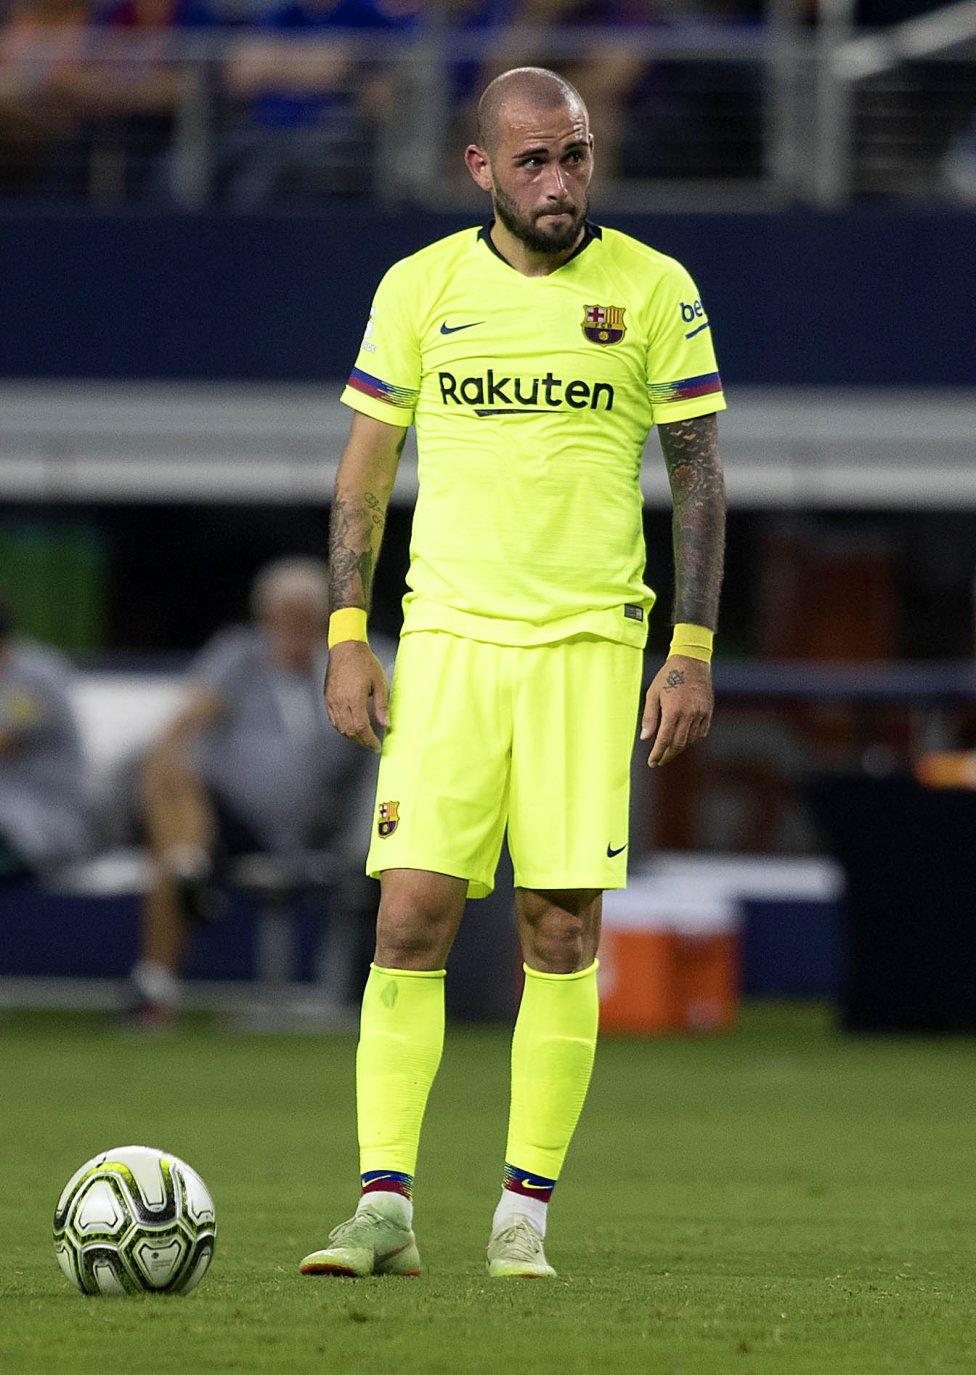 صور مباراة : برشلونة - روما 4-2 ( 01-08-2018 )  1533094115_173347_1533096808_album_grande